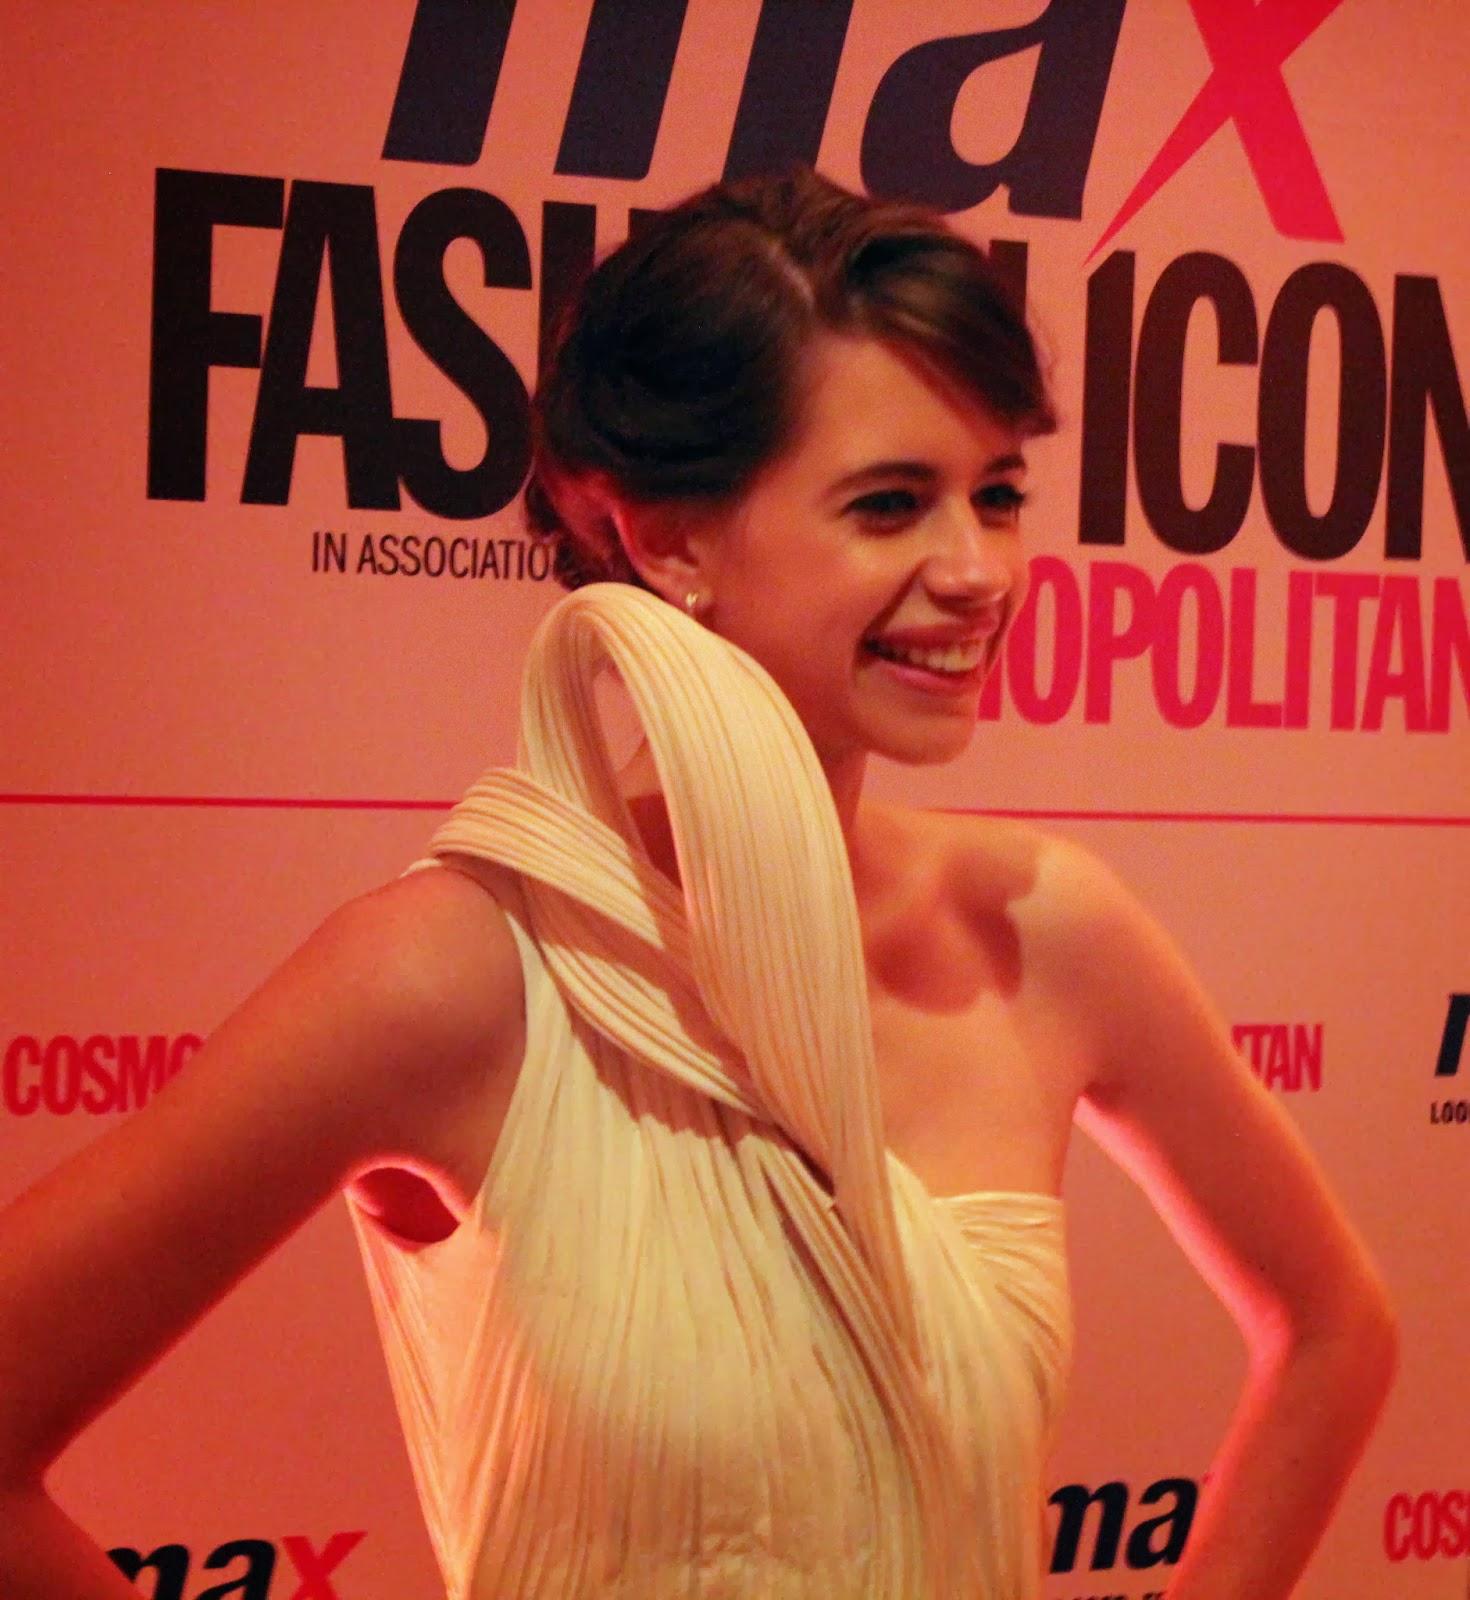 Kalki Koechlin - MAX Fashion Icon 2014 In Collaboration  With Cosmopolitan Magazine Grand Finale - All Pictures, Uncut Version